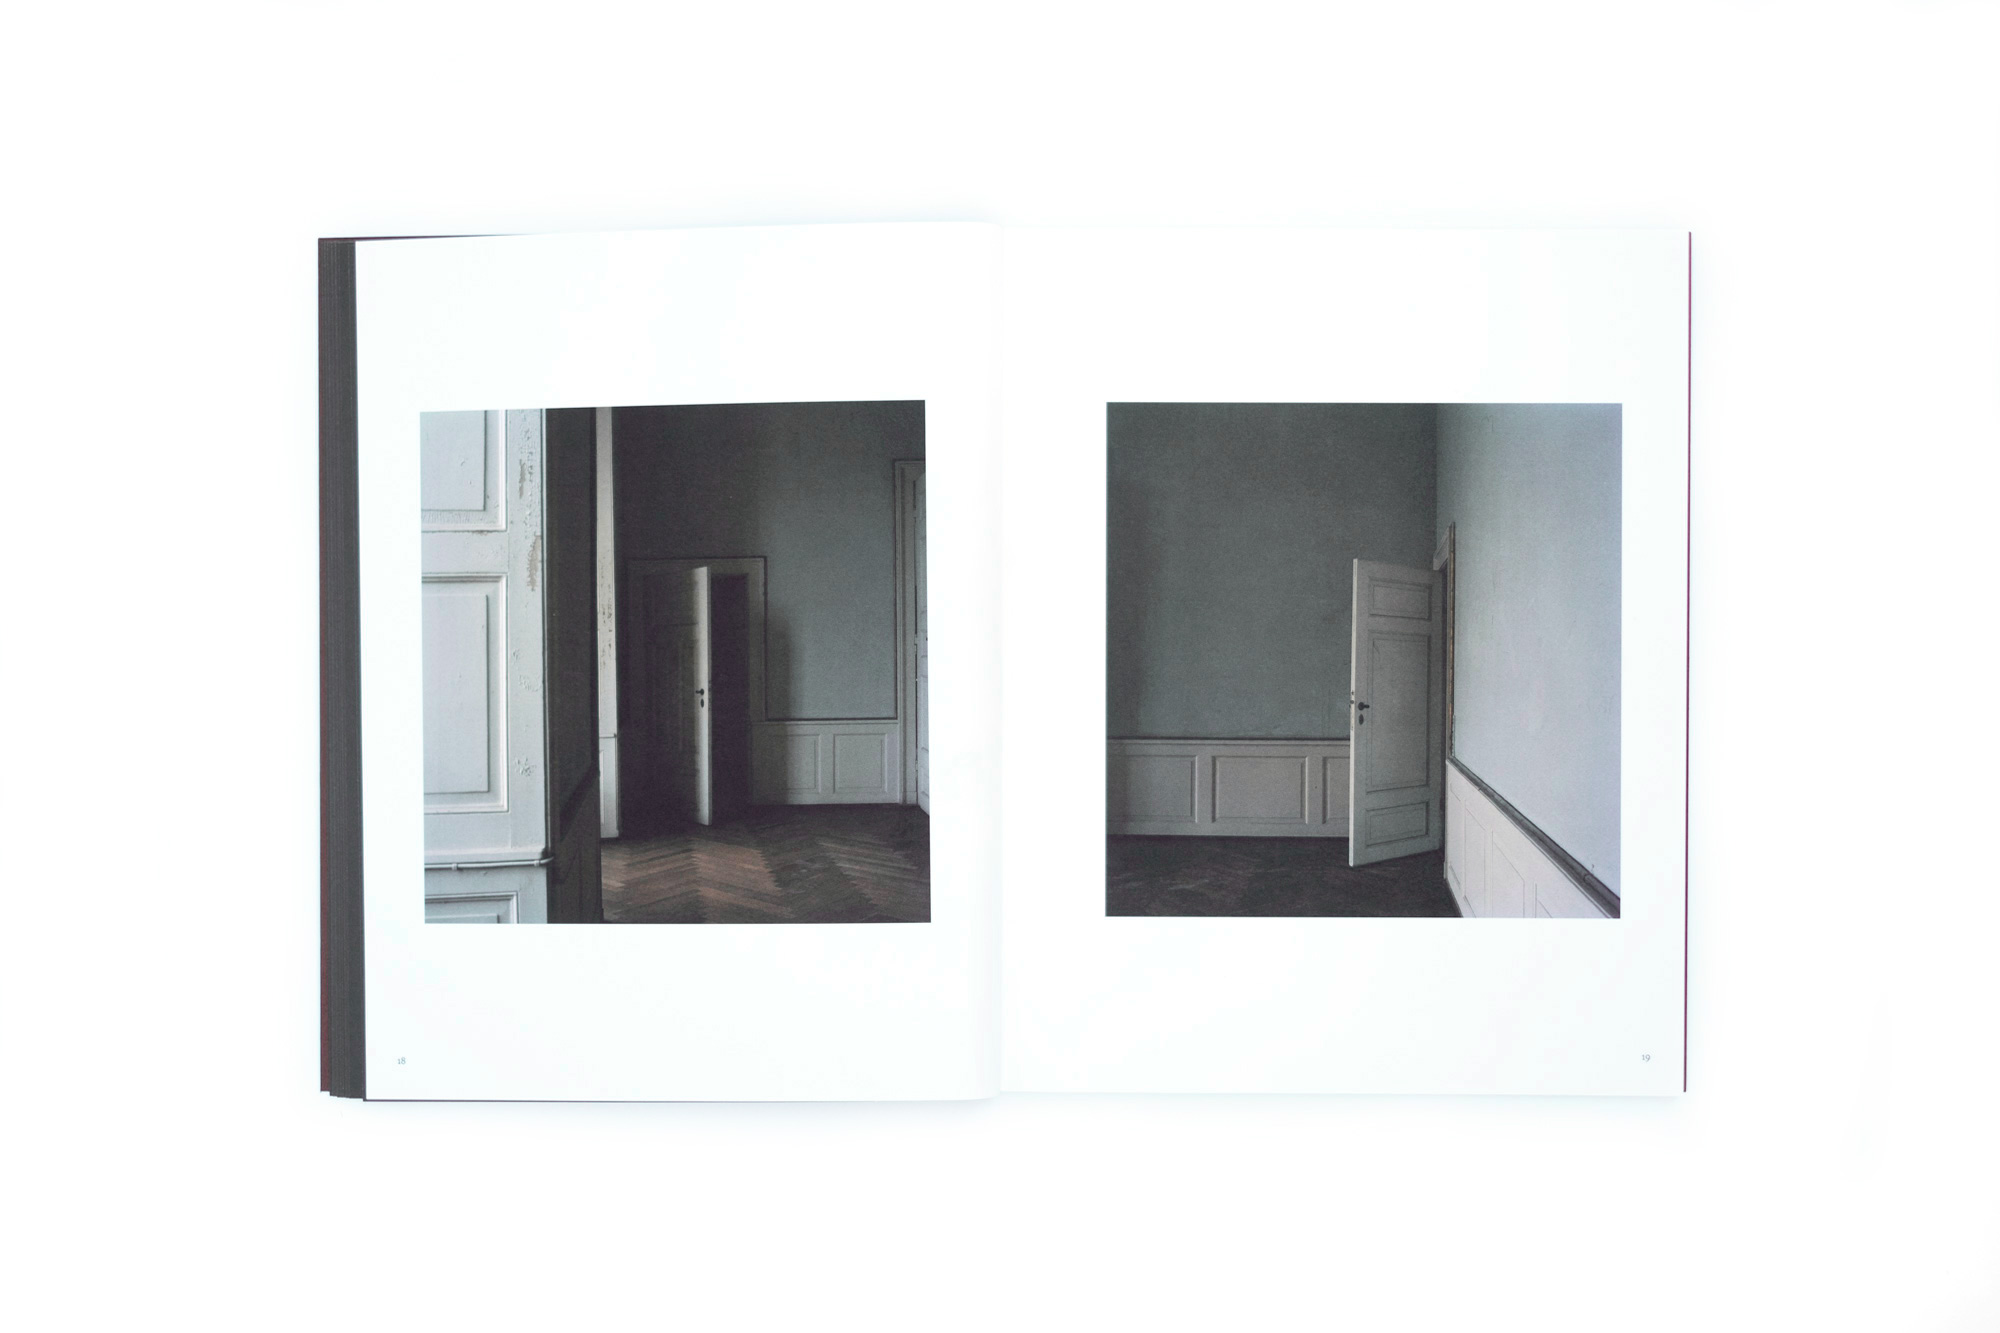 trine_sondergaard_lumieres_nordique_muma_book_spread22